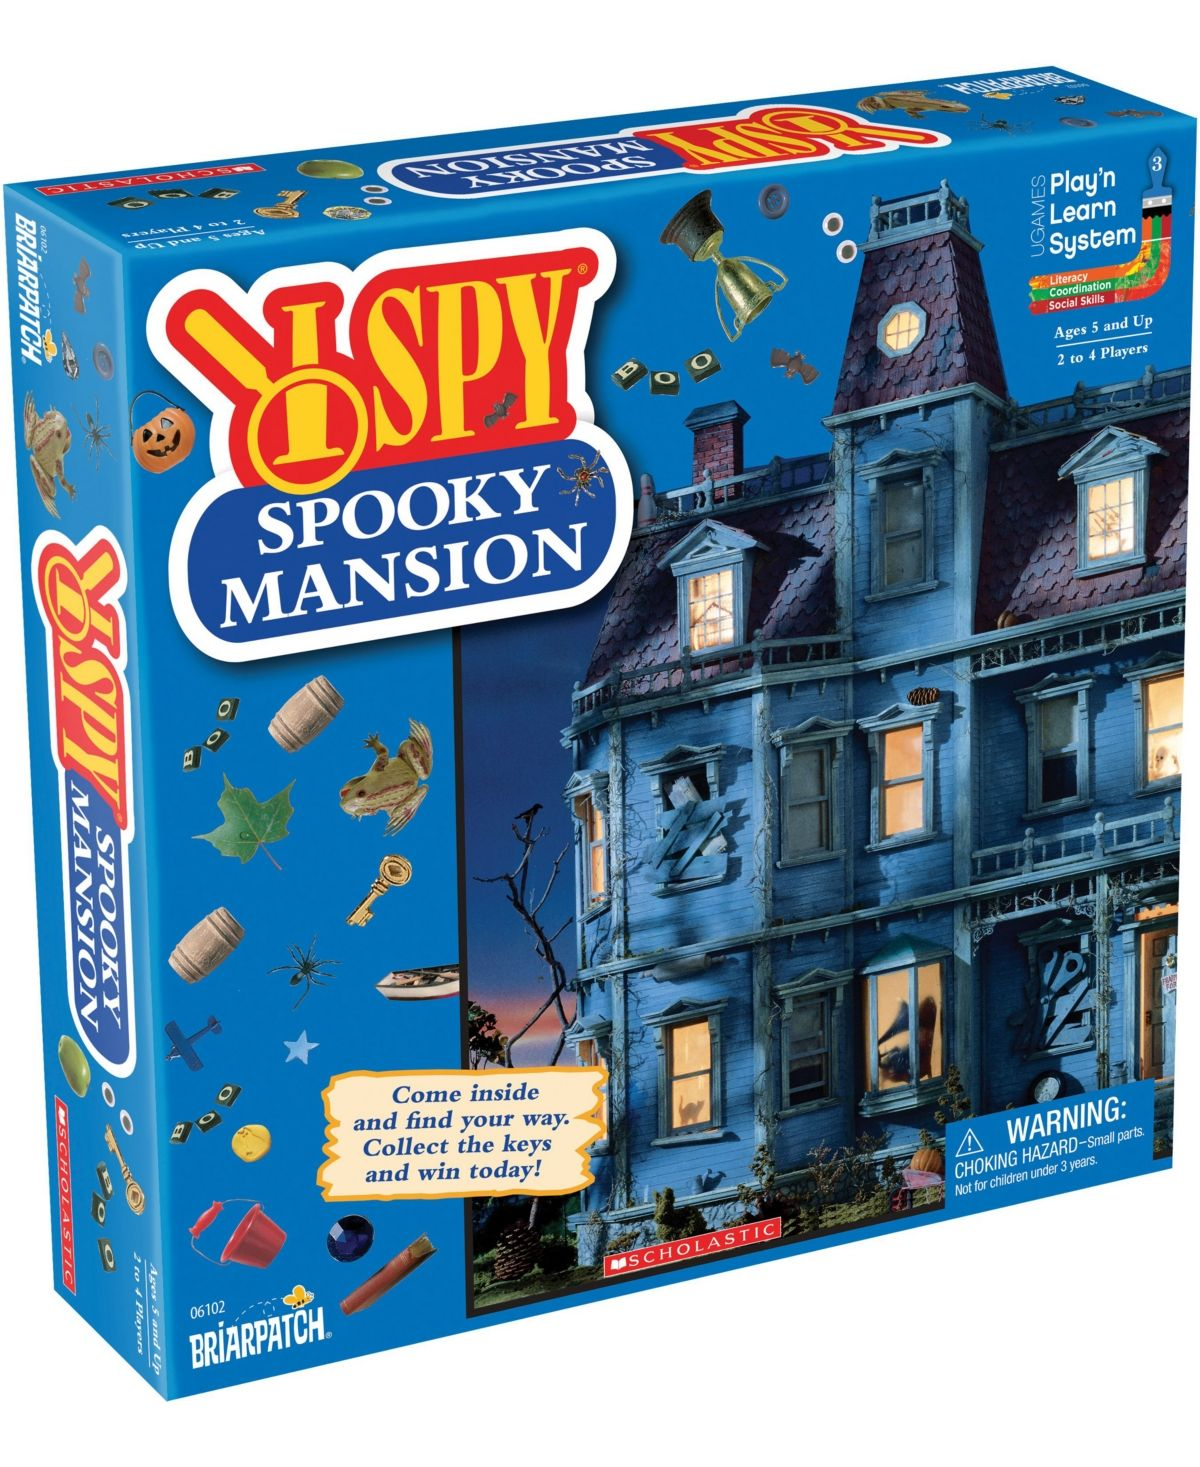 I Spy Spooky Mansion I spy, Puzzle games for kids